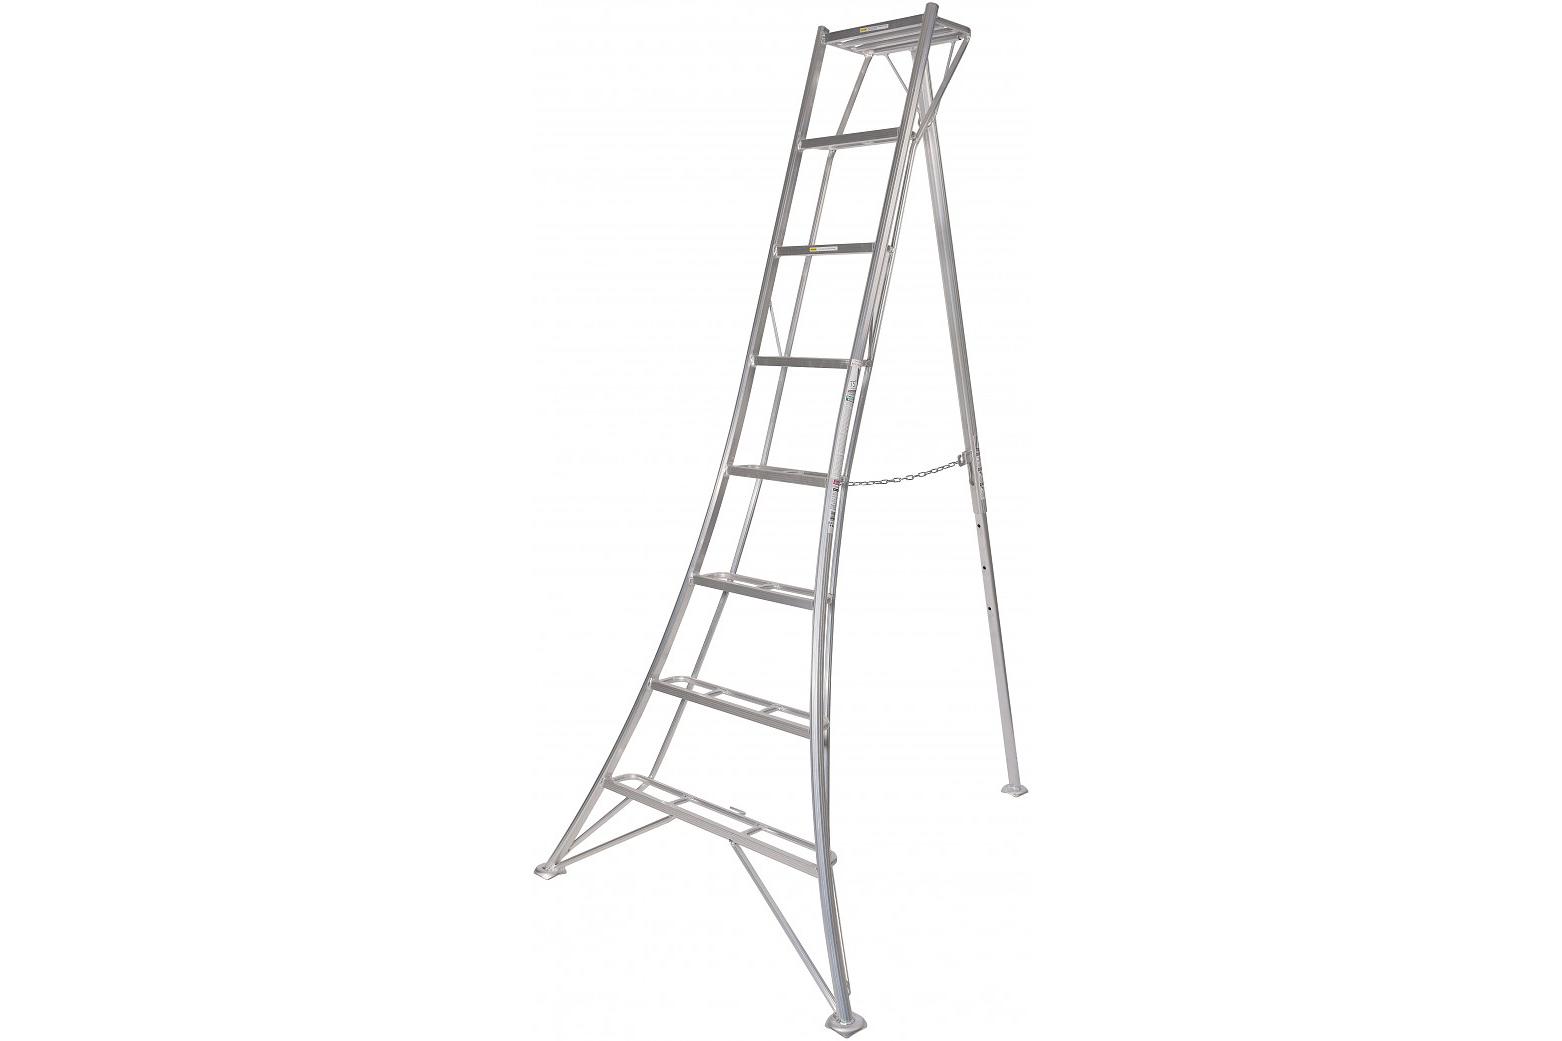 8-niwaki-tripod-ladder.jpg